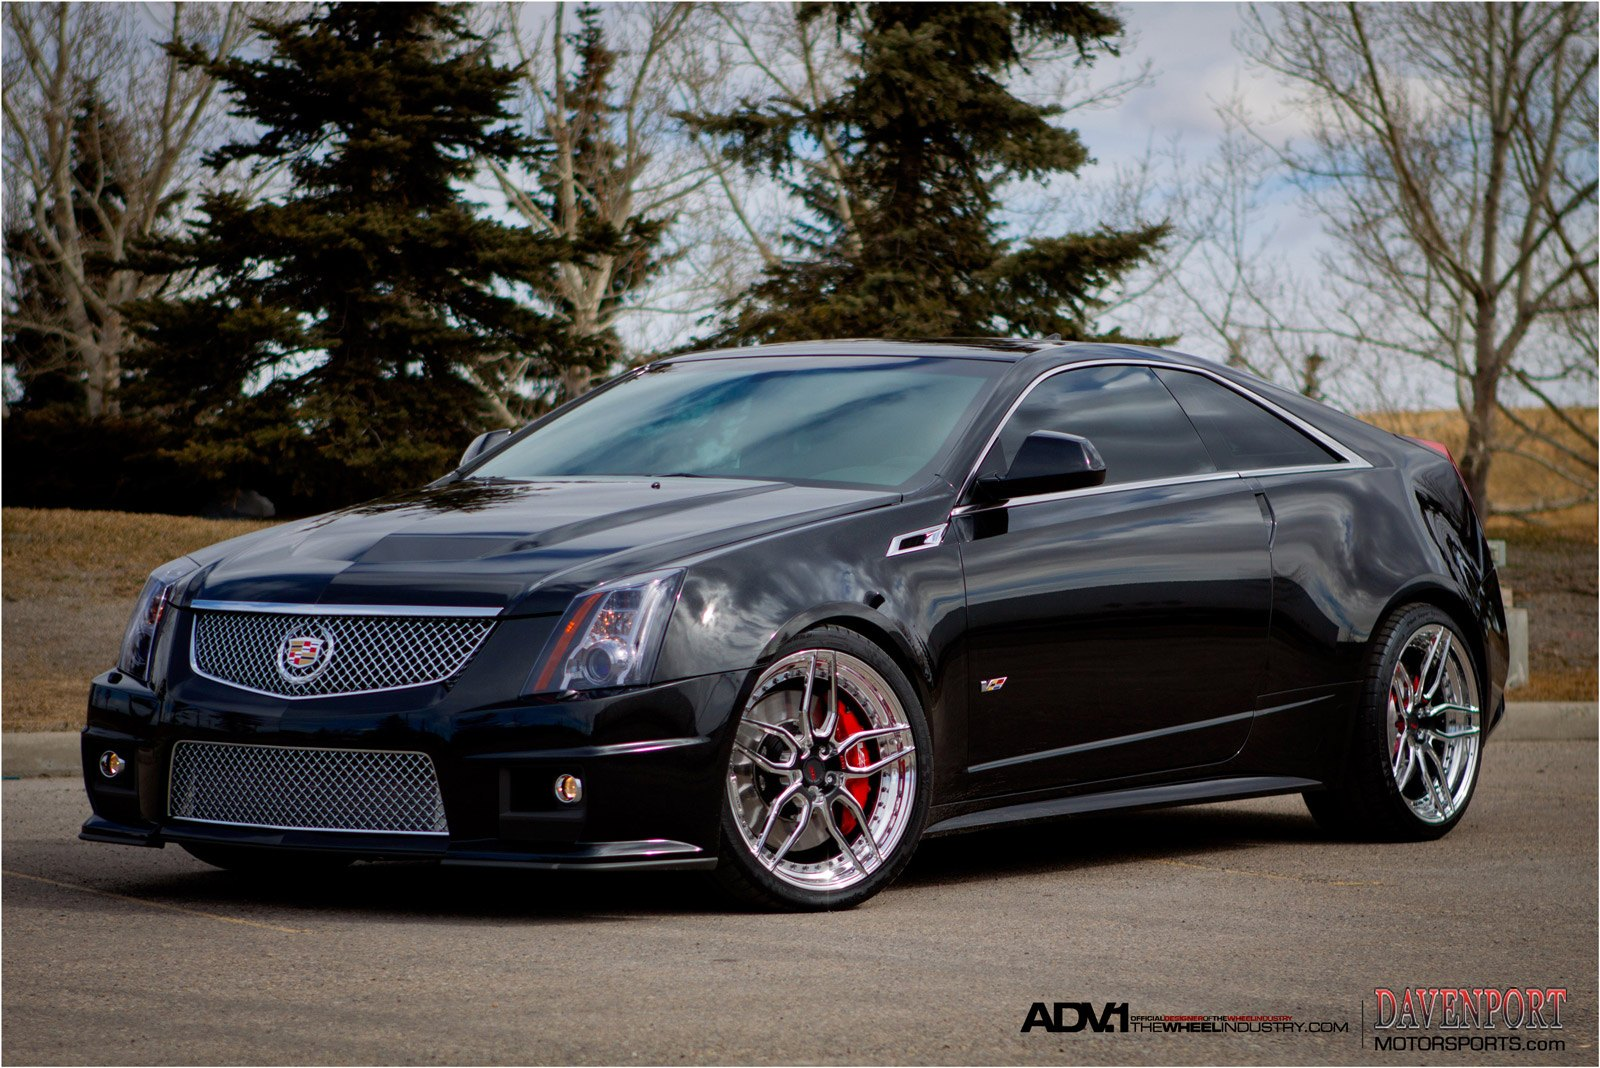 Mirror Polished Modular Adv1 Rims On Black Cadillac Cts V